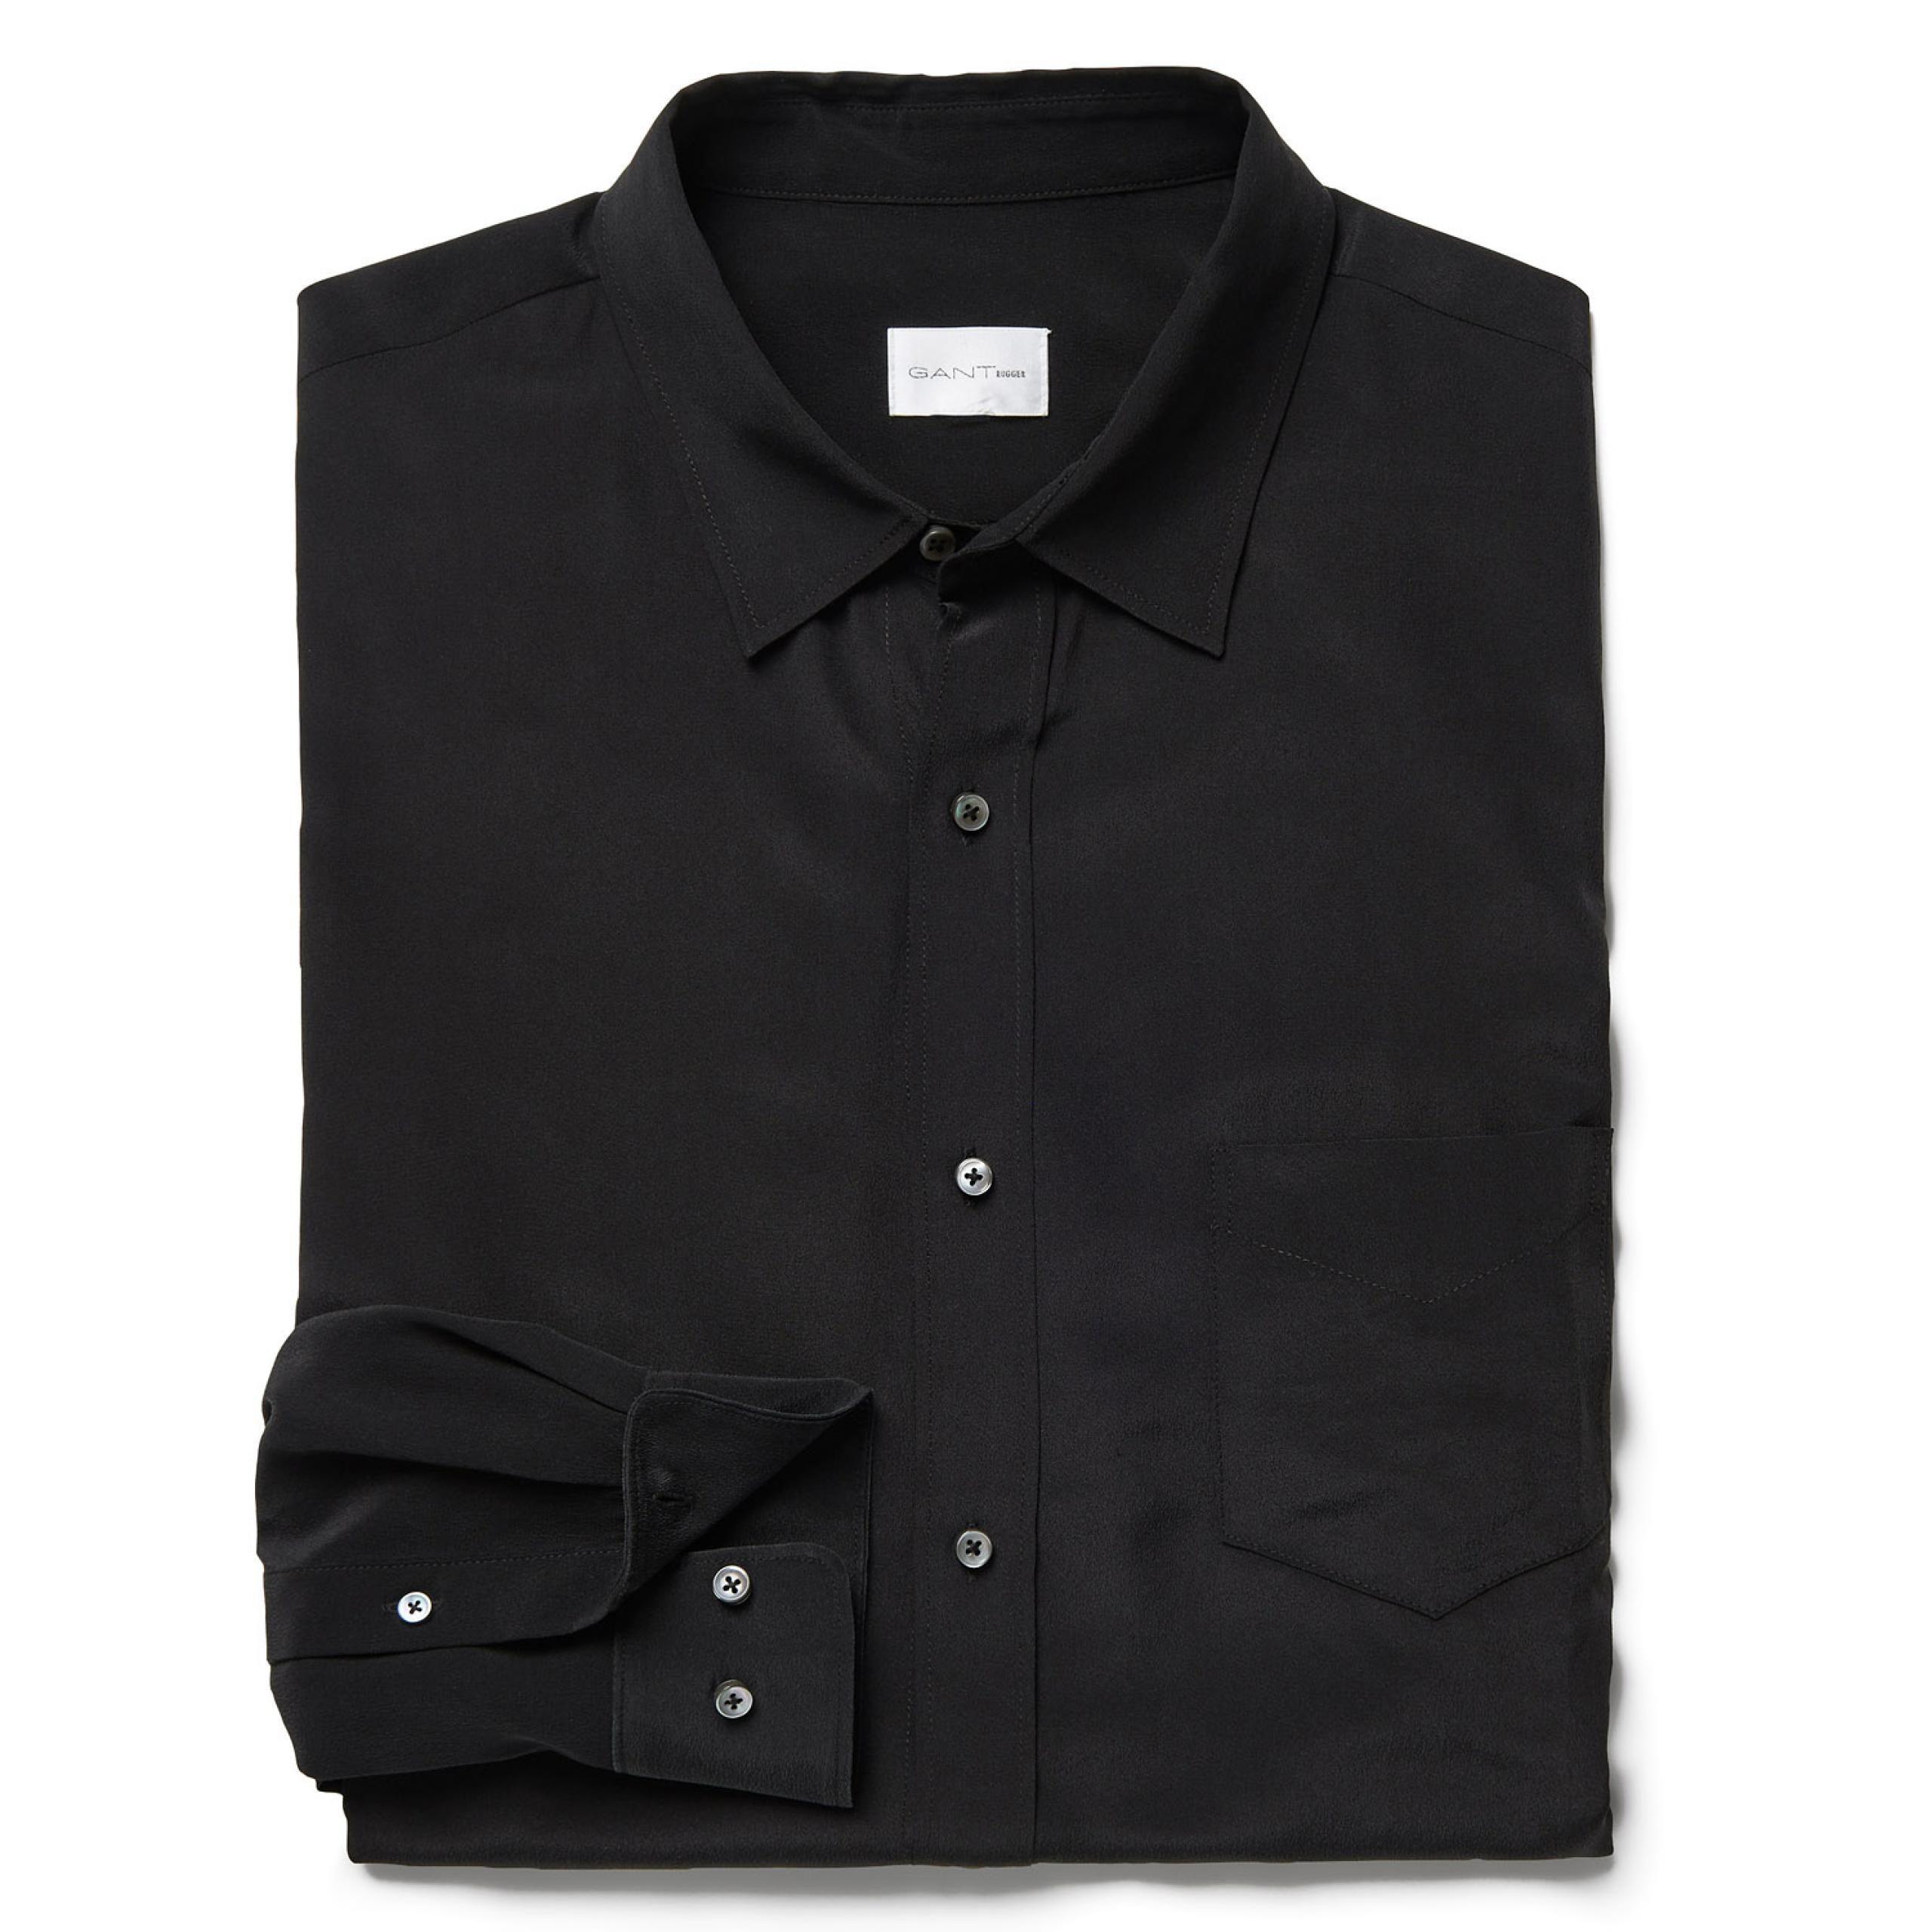 GANT Rugger: Black Silk Loose Shirt Men's | GANT USA Store | Fly ...